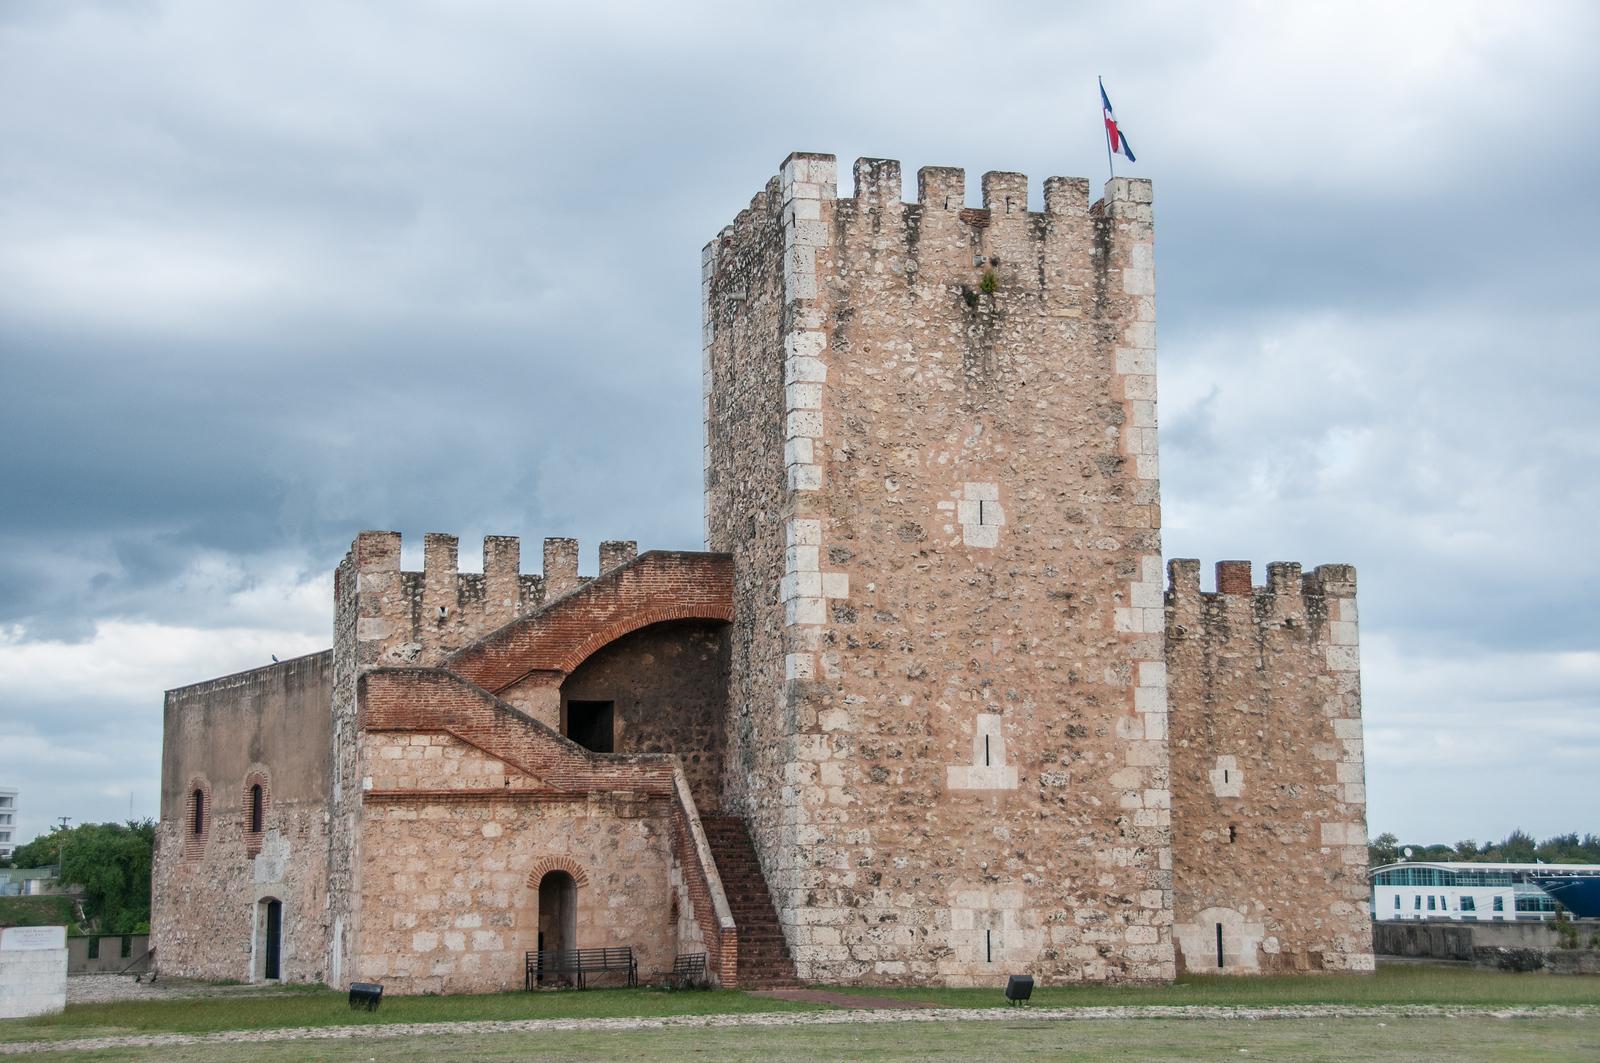 Colonial City of Santo Domingo UNESCO World Heritage Site